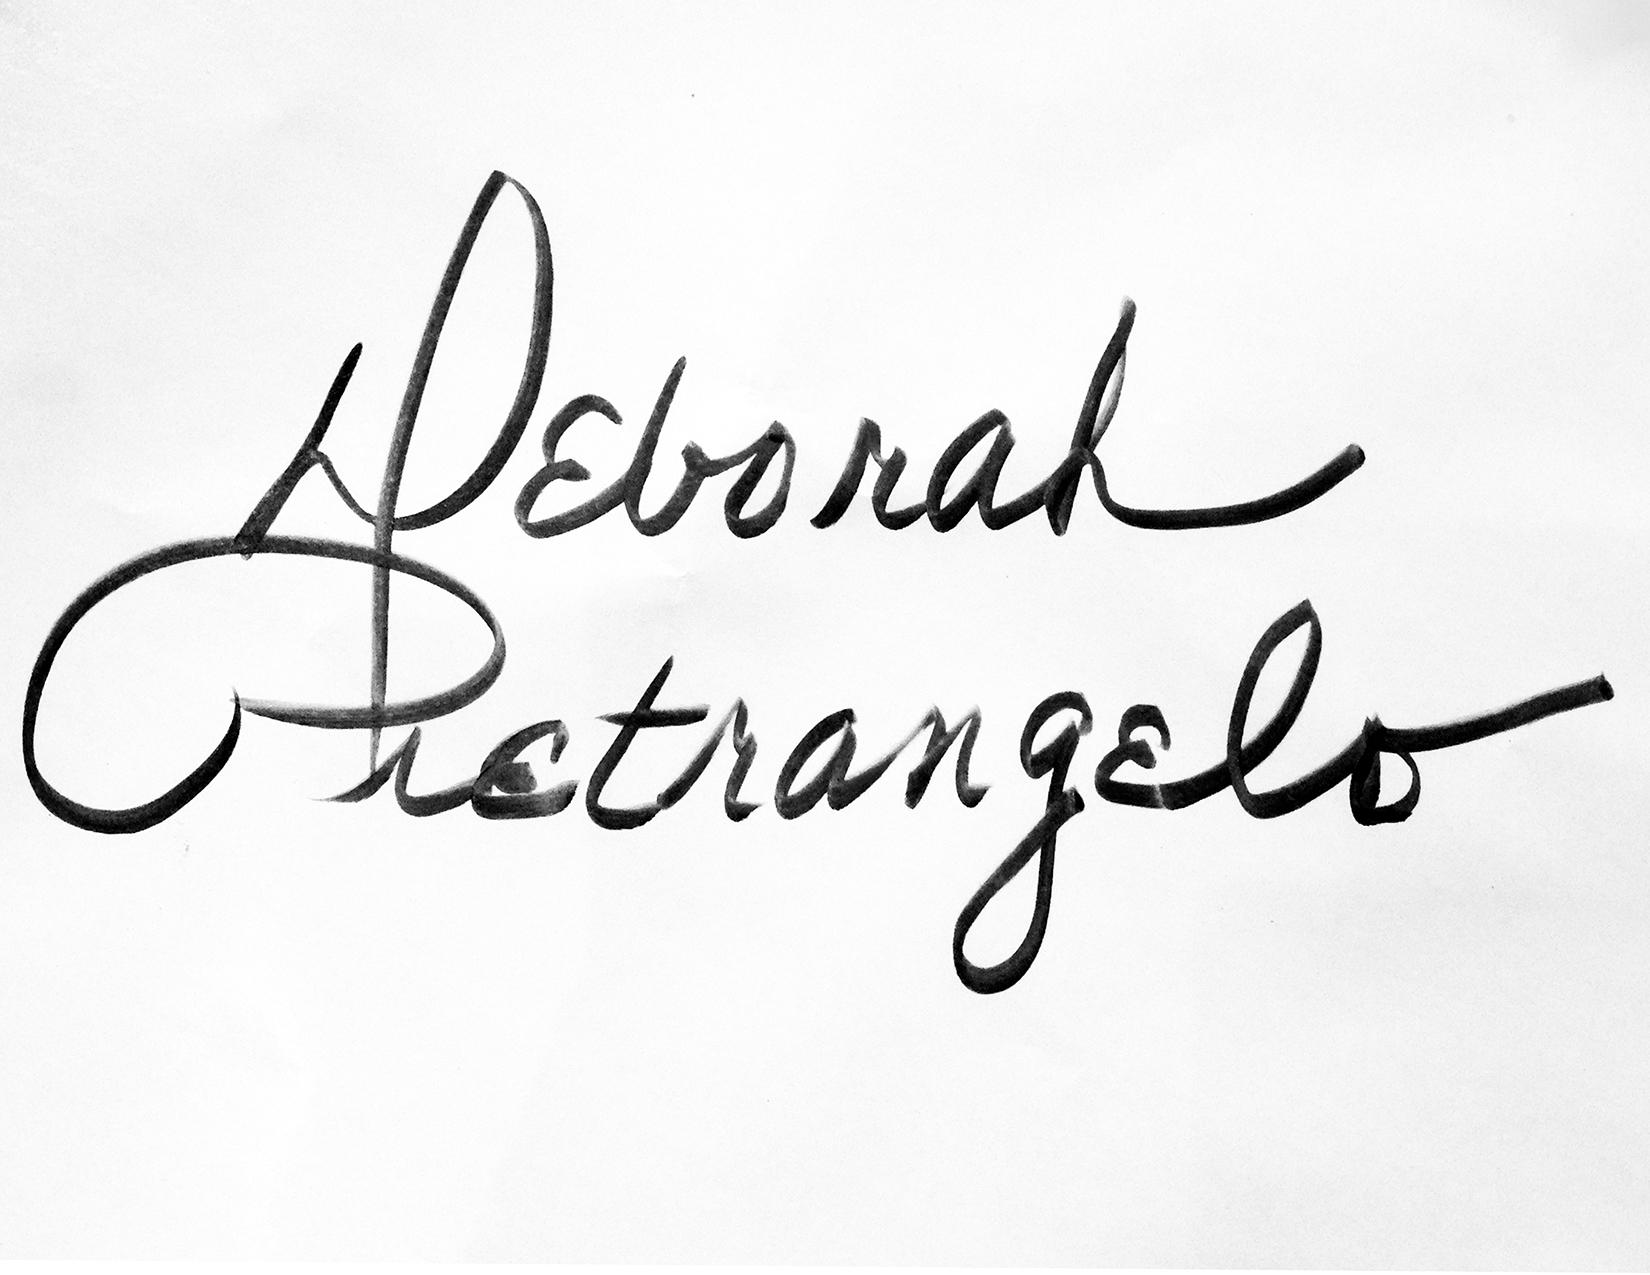 Deborah Pietrangelo's Signature